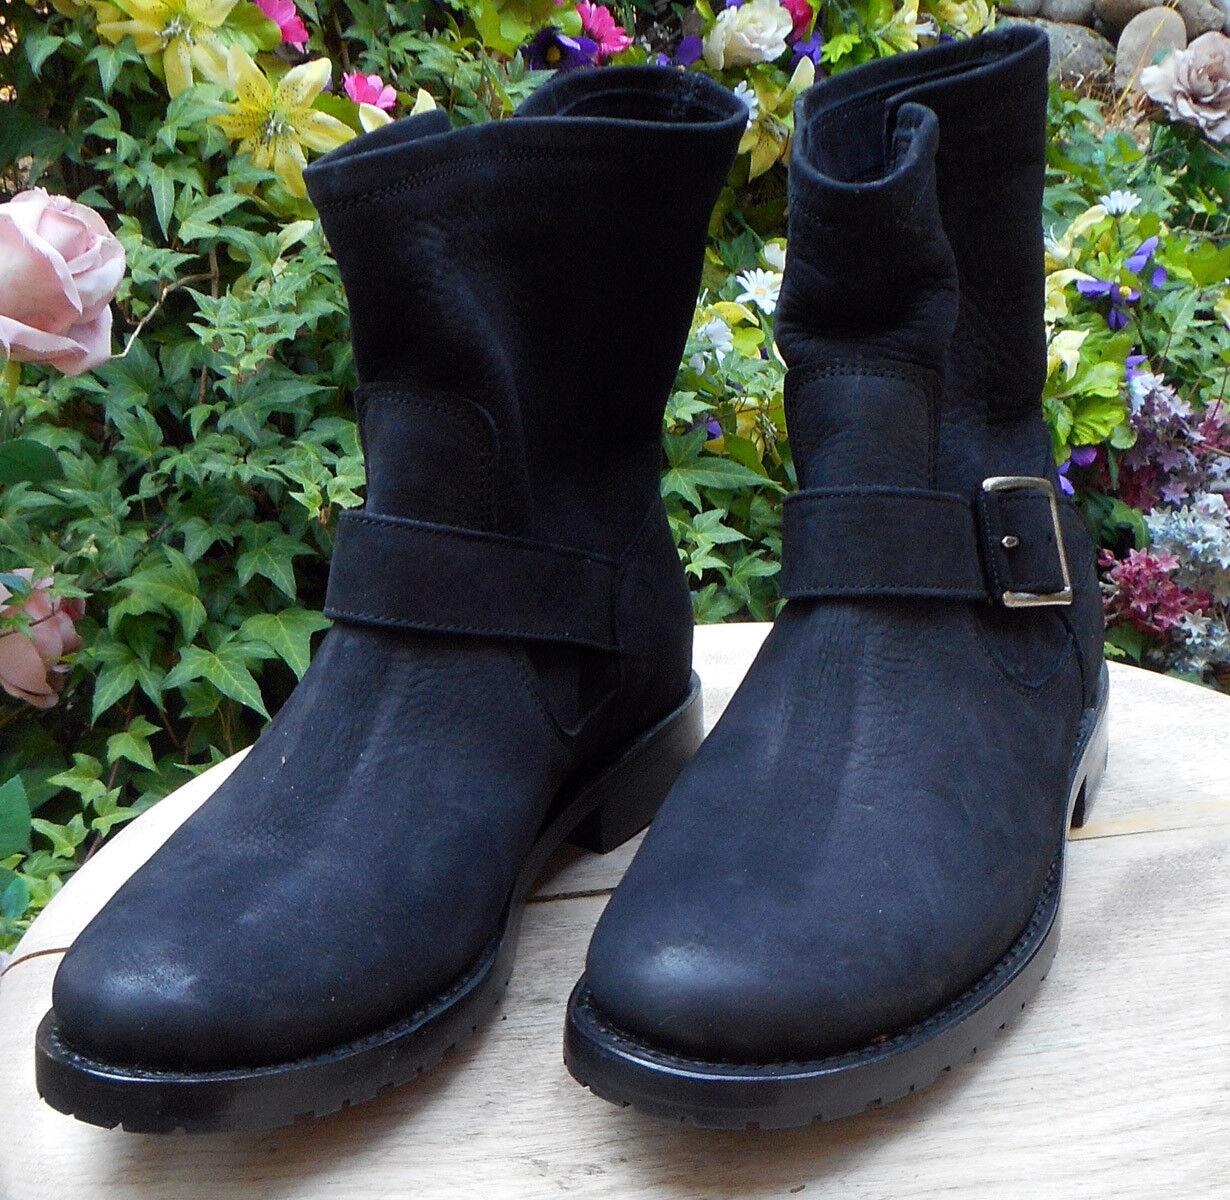 New  FRYE Women's Natalie Short Black Napa Leather Engineer Boot  7 M